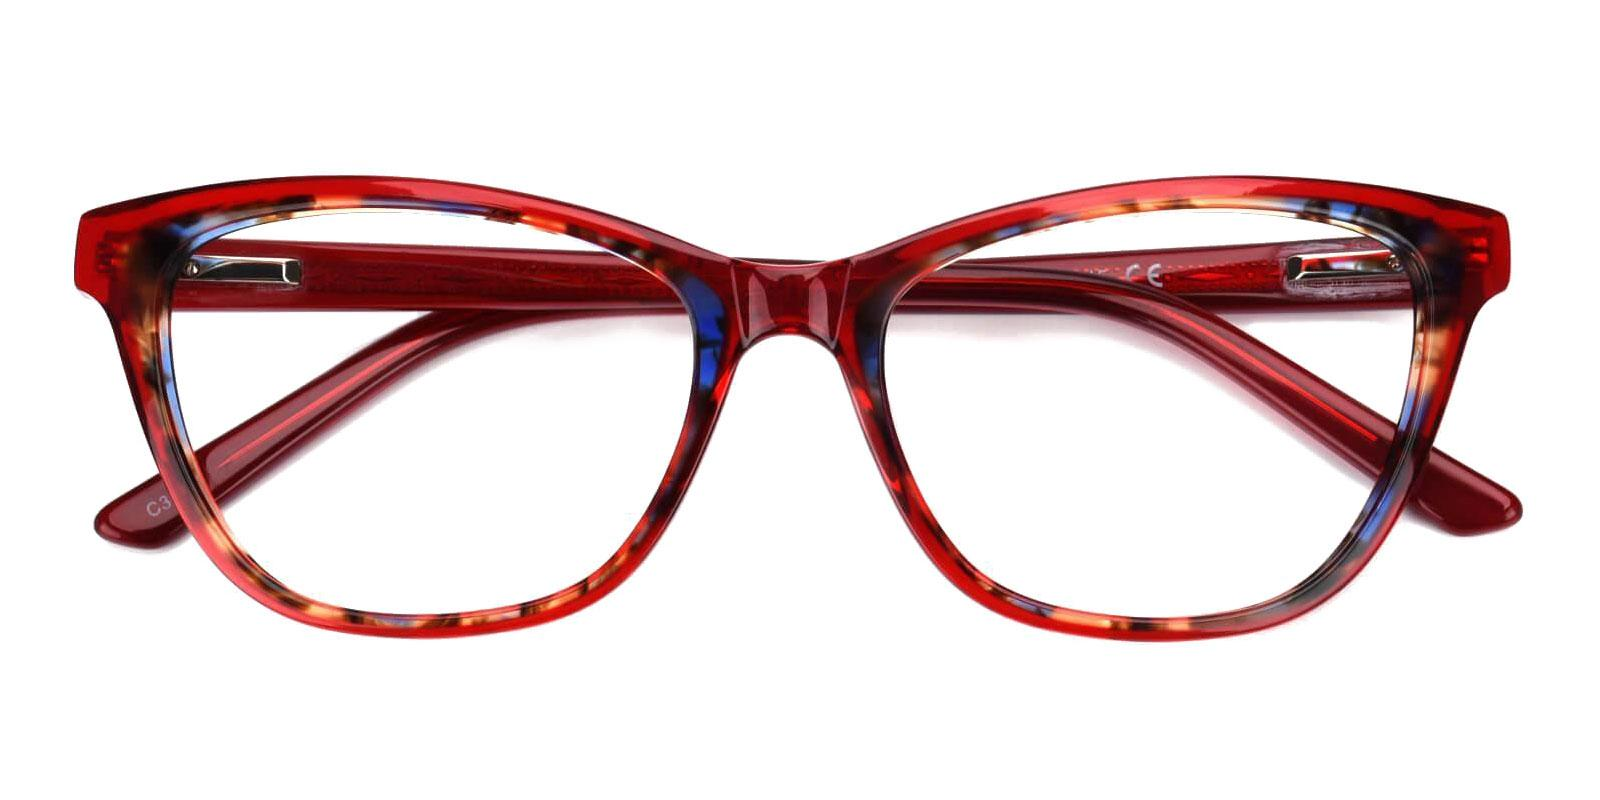 Strauss Red Acetate Eyeglasses , UniversalBridgeFit Frames from ABBE Glasses